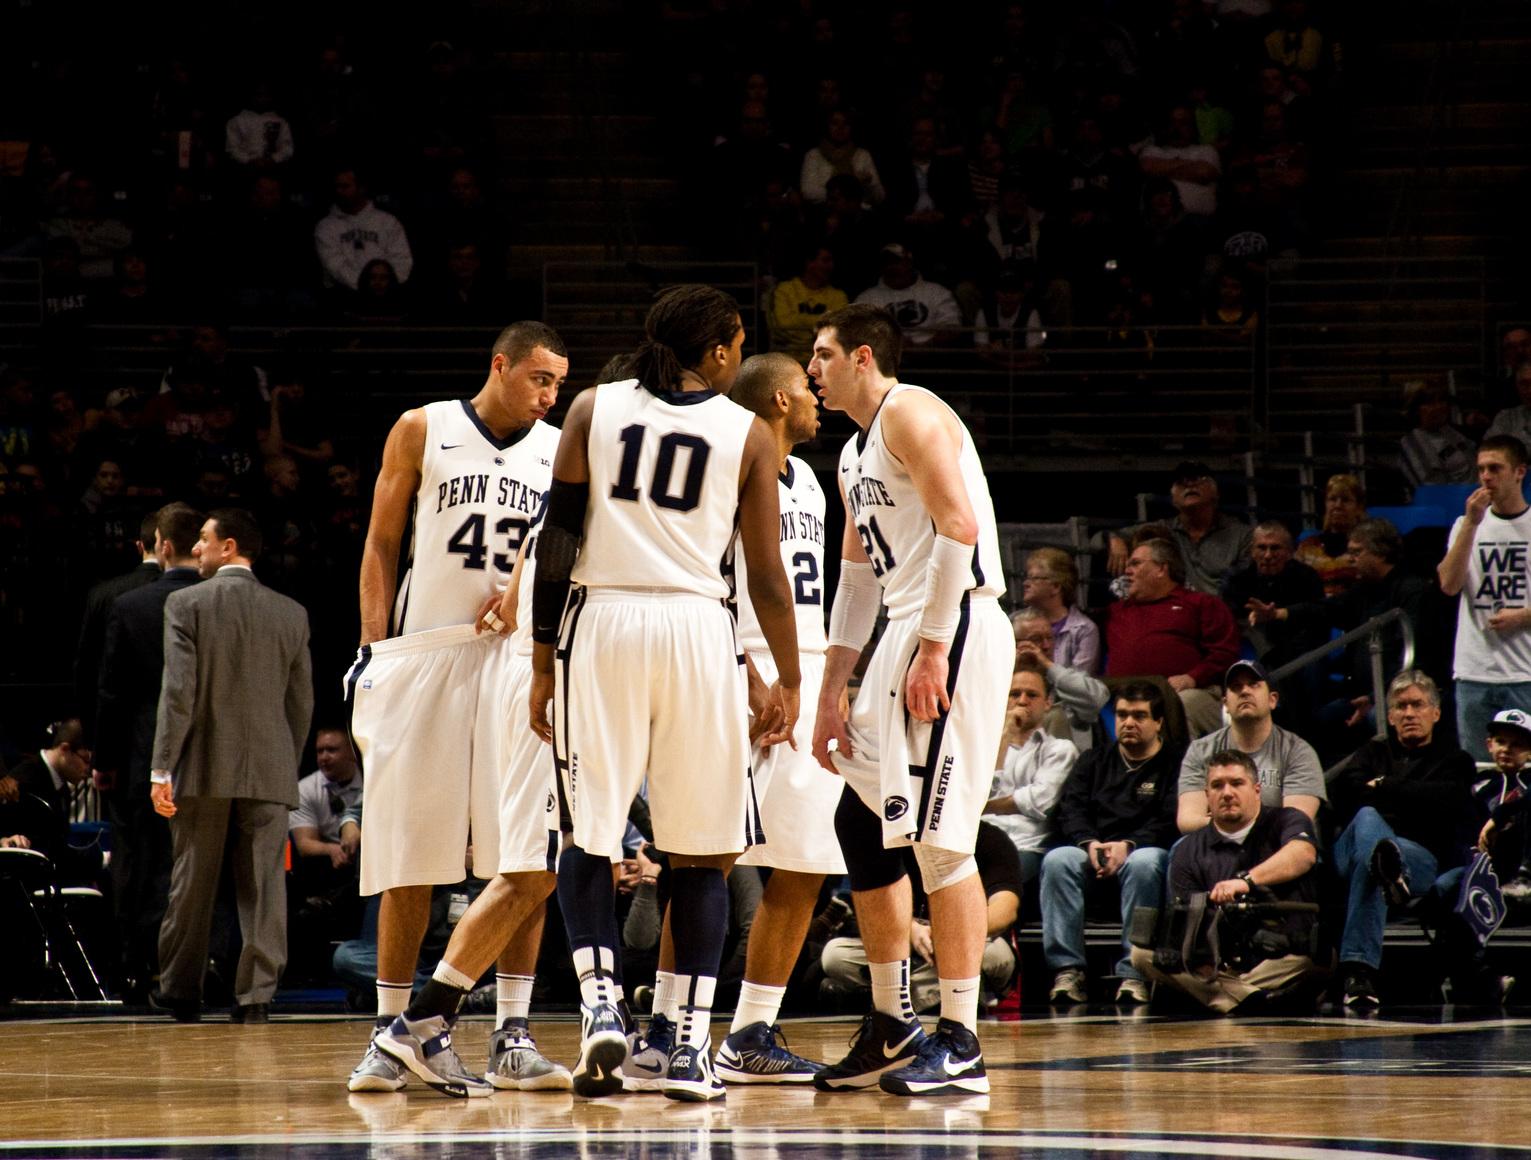 Penn State huddle.